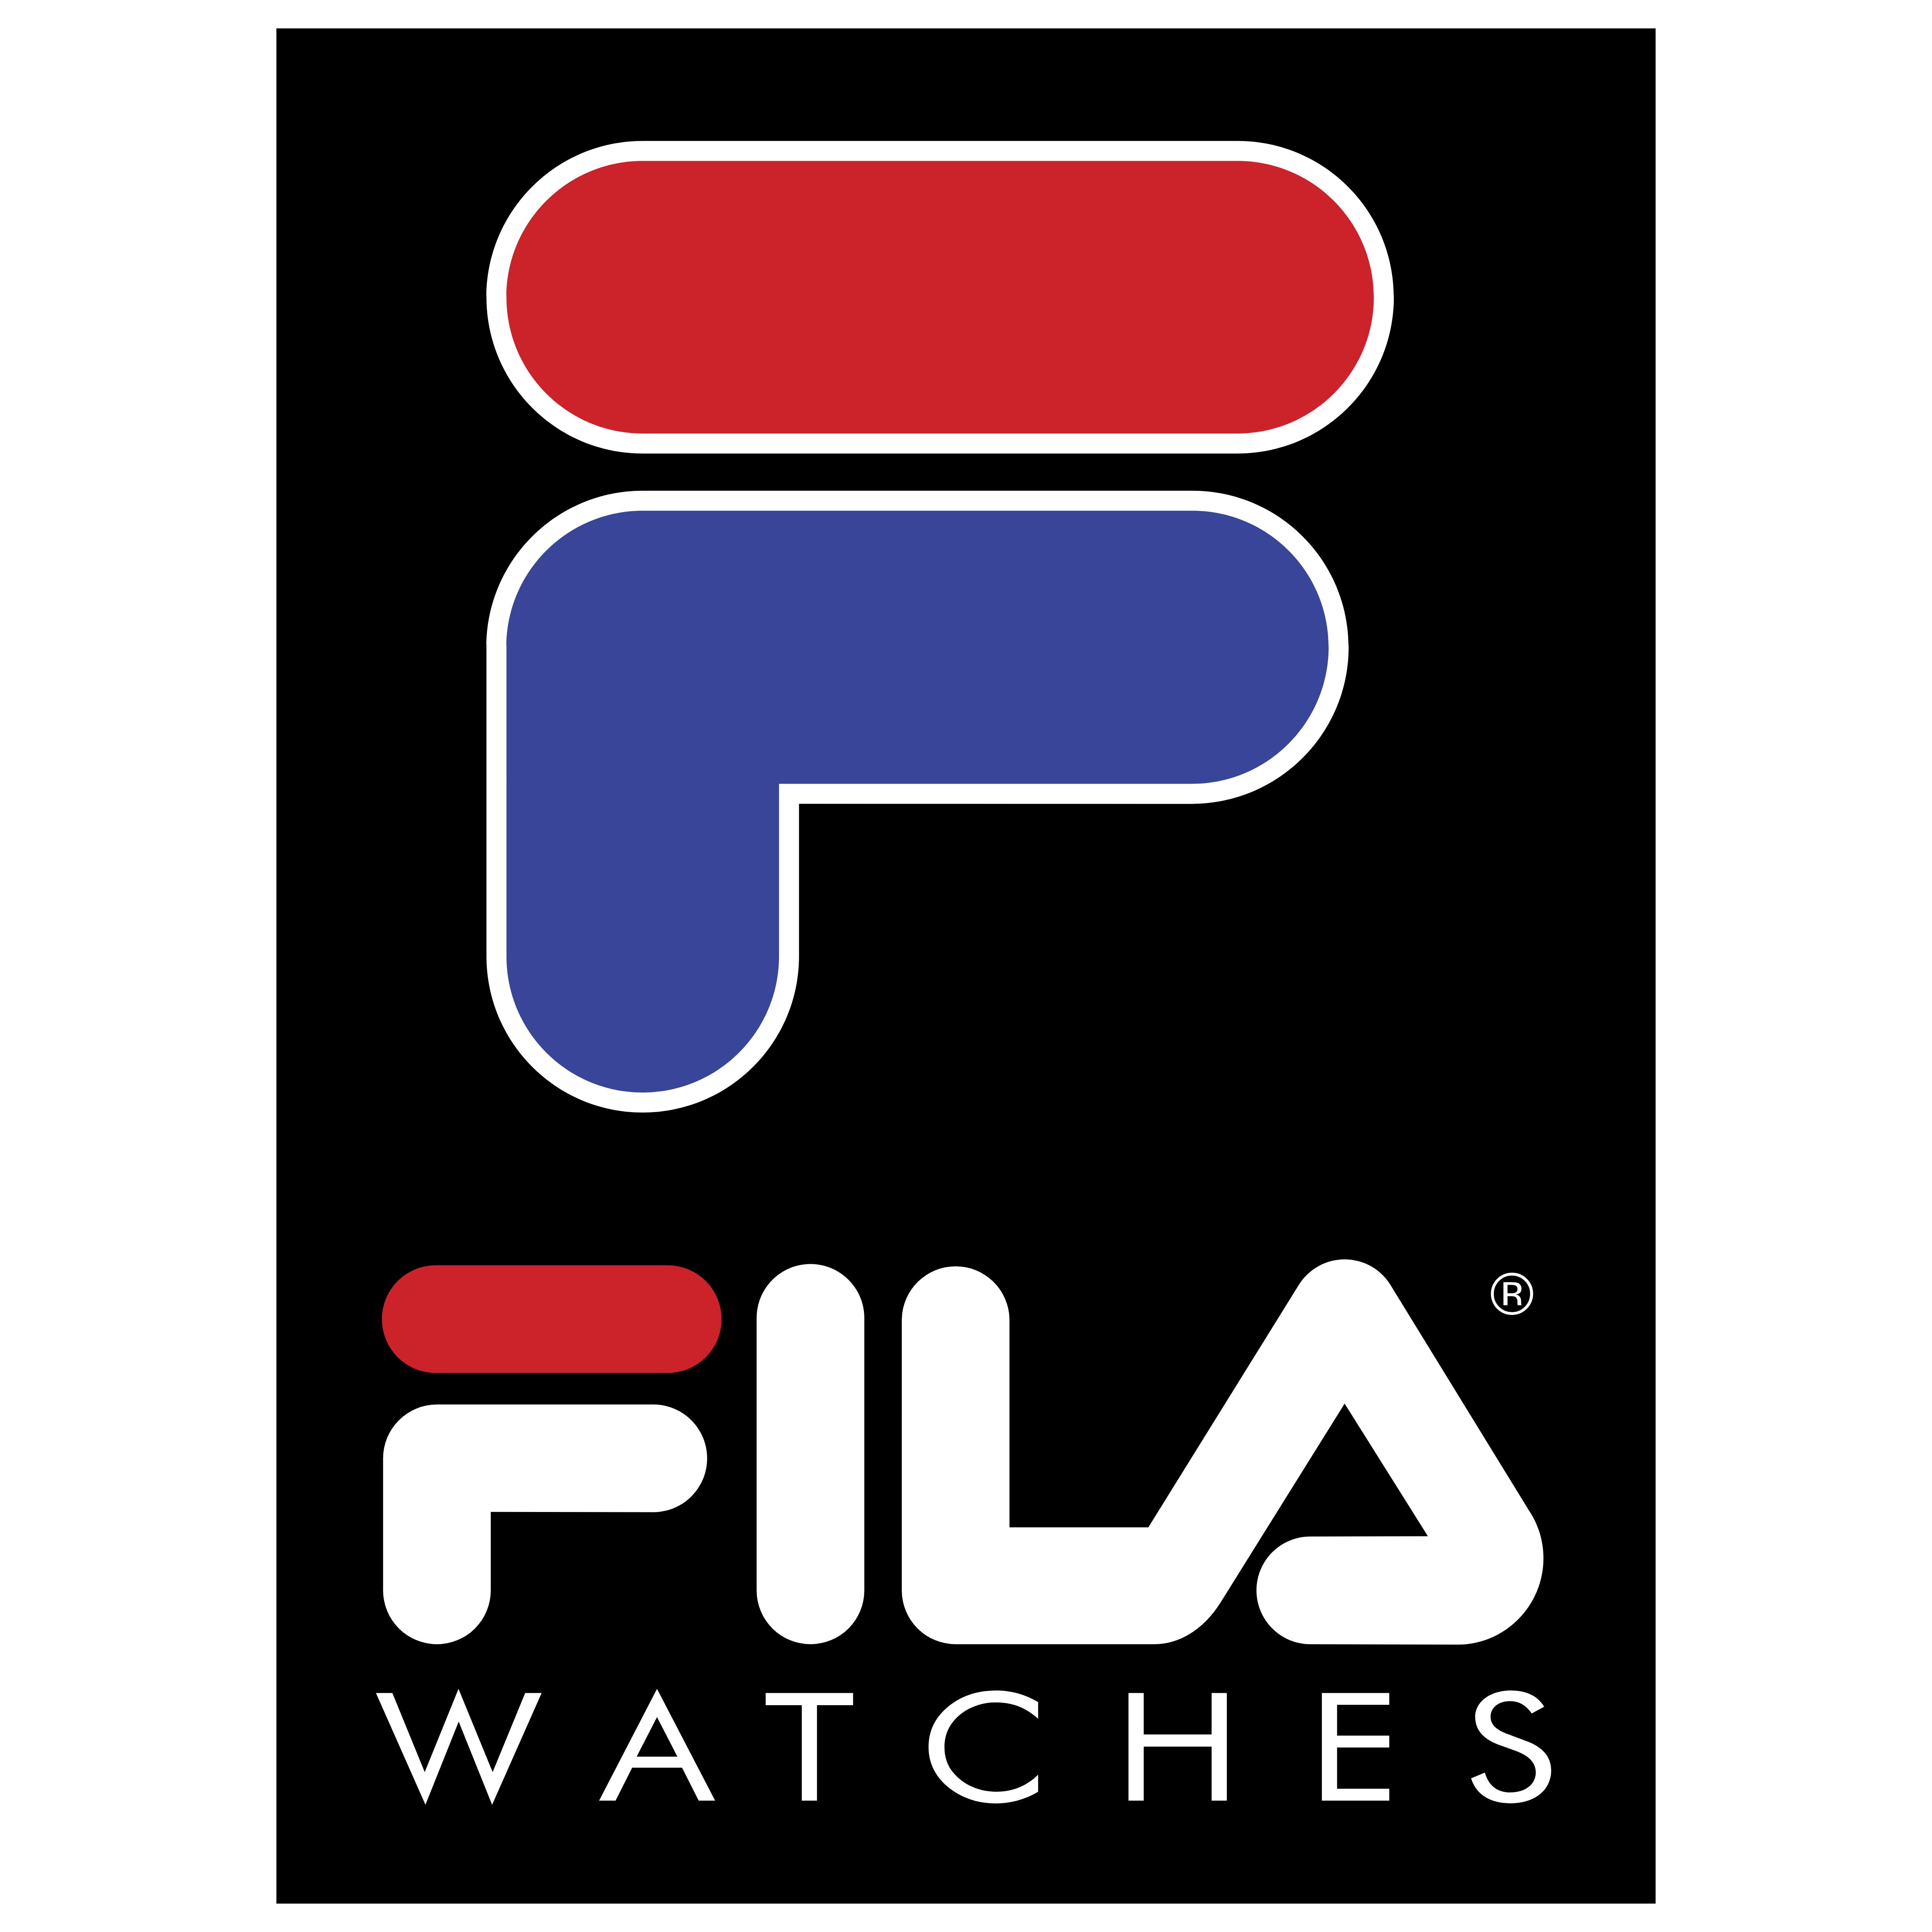 Fila Logos Download